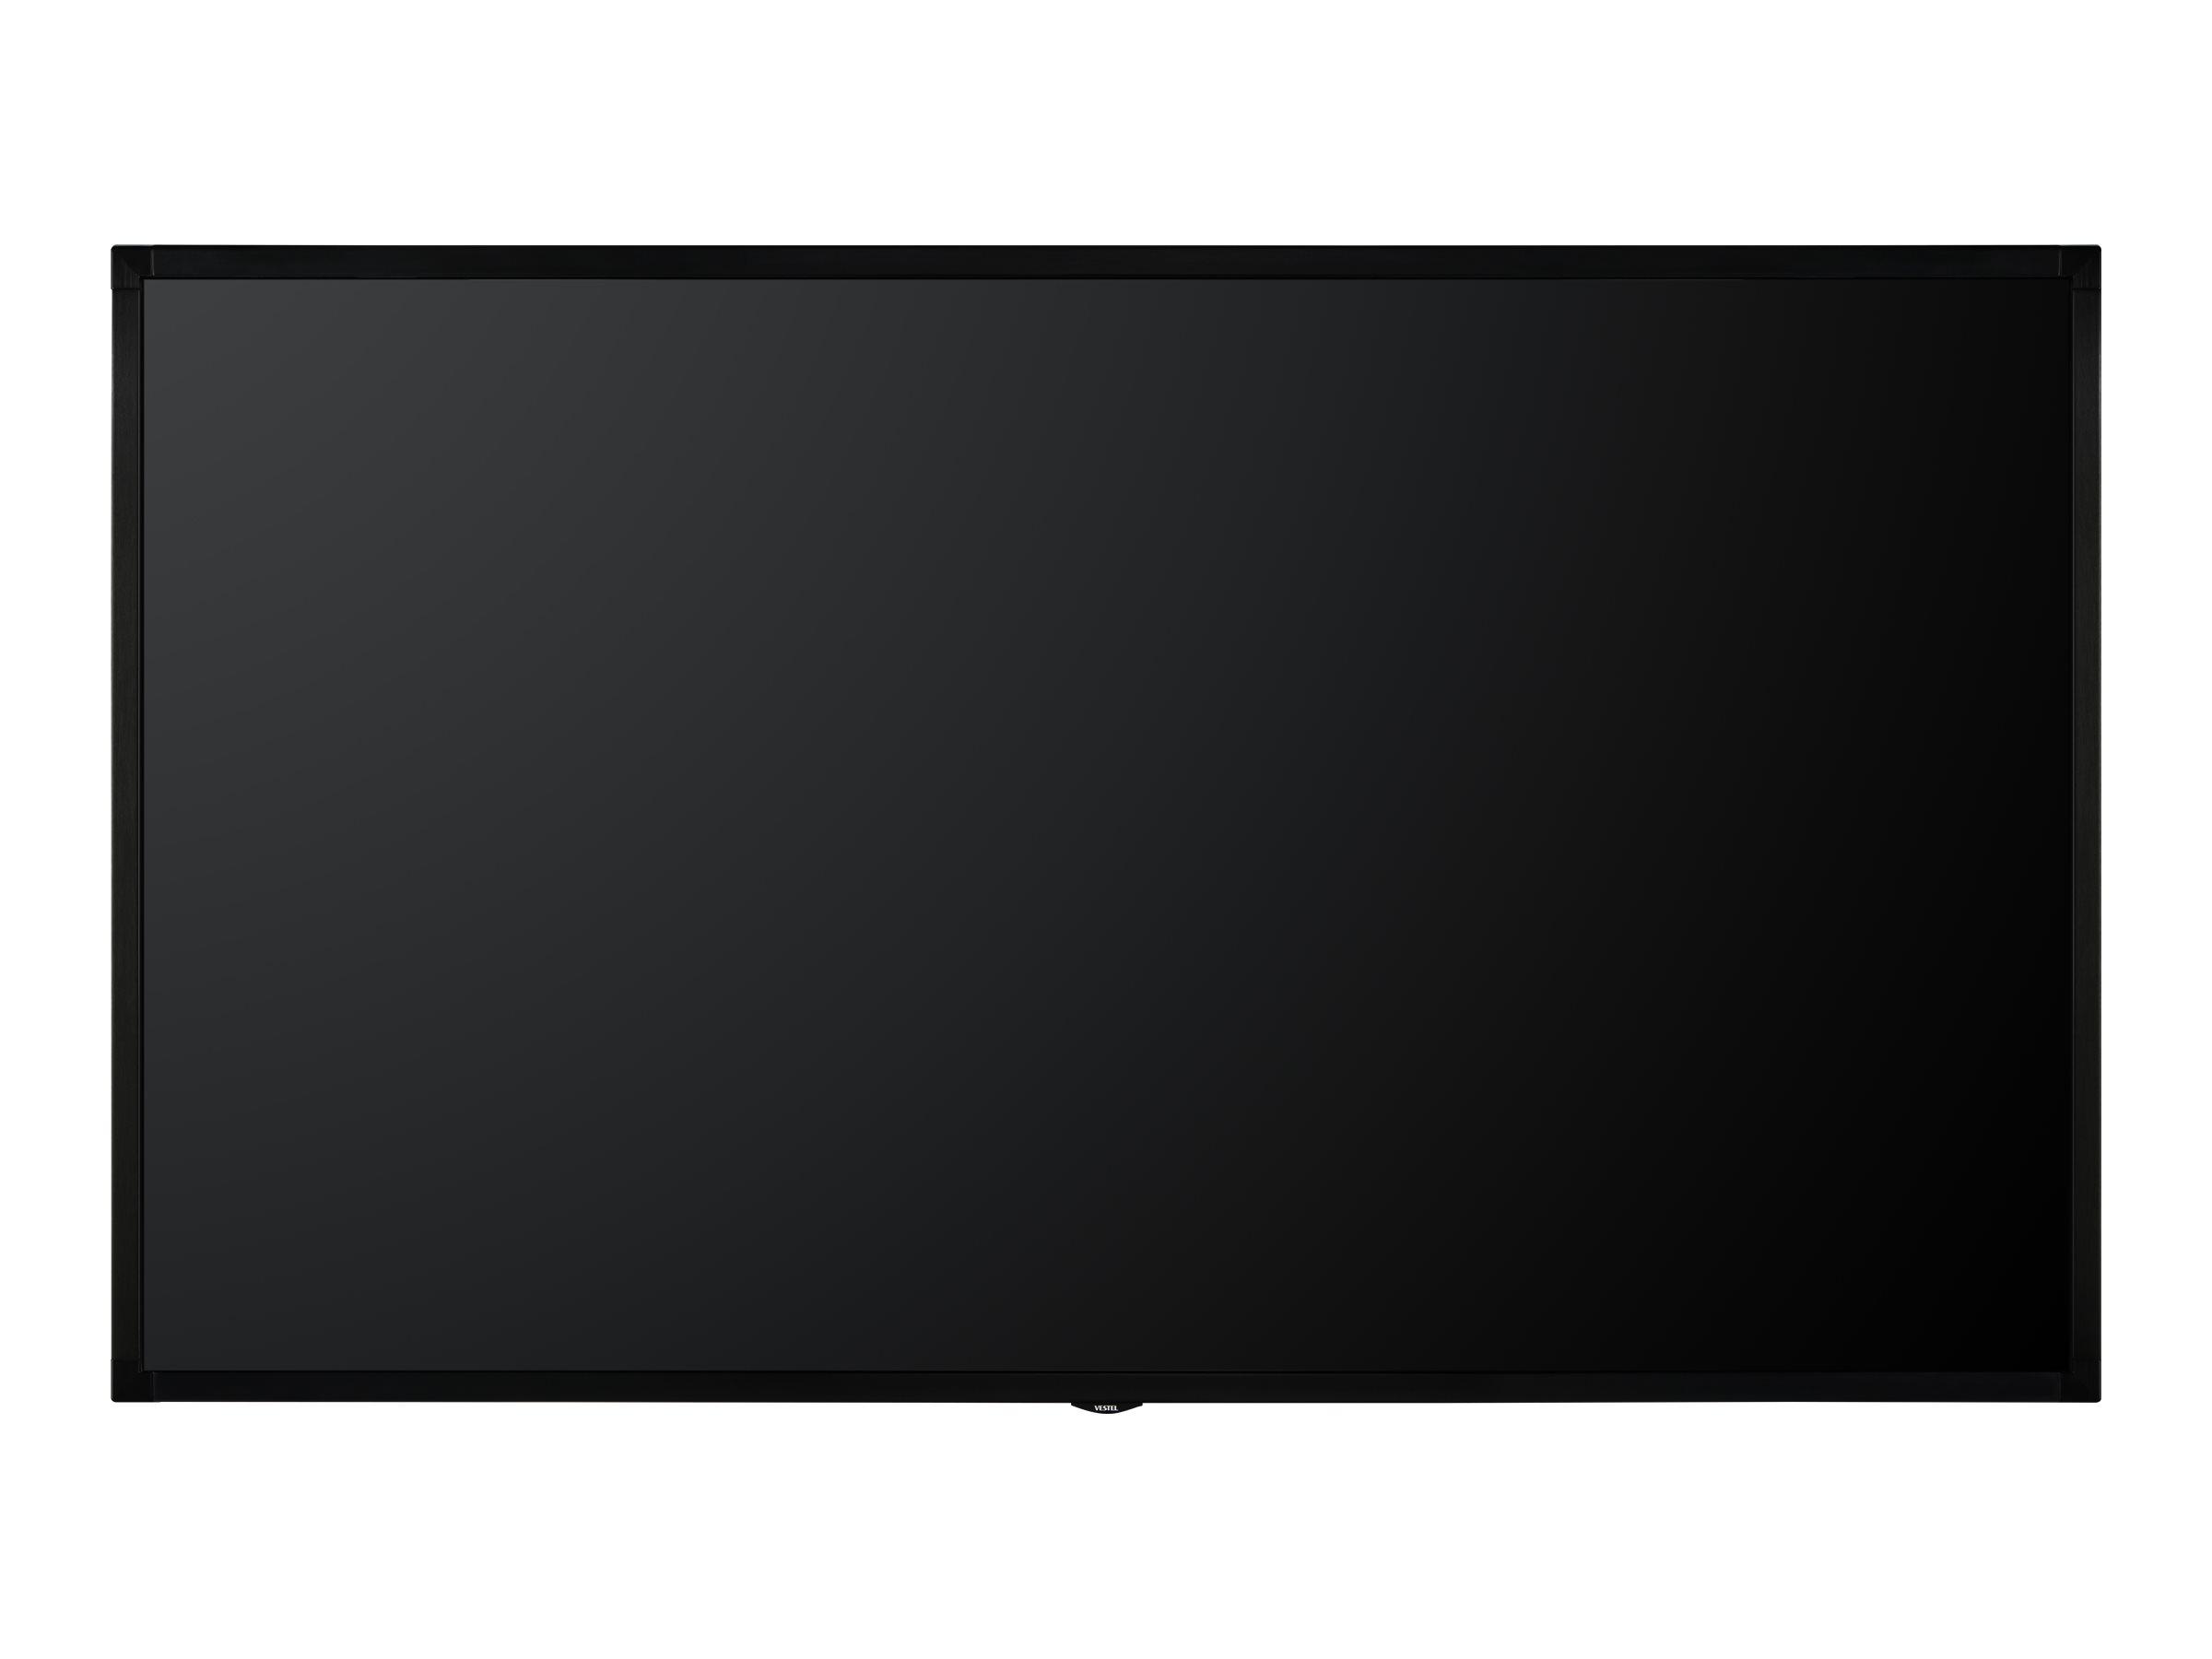 "VESTEL PDU98S31B/7 - 248.9 cm (98"") Klasse PDU Series LED-Display - Digital Signage - 4K UHD (2160p)"